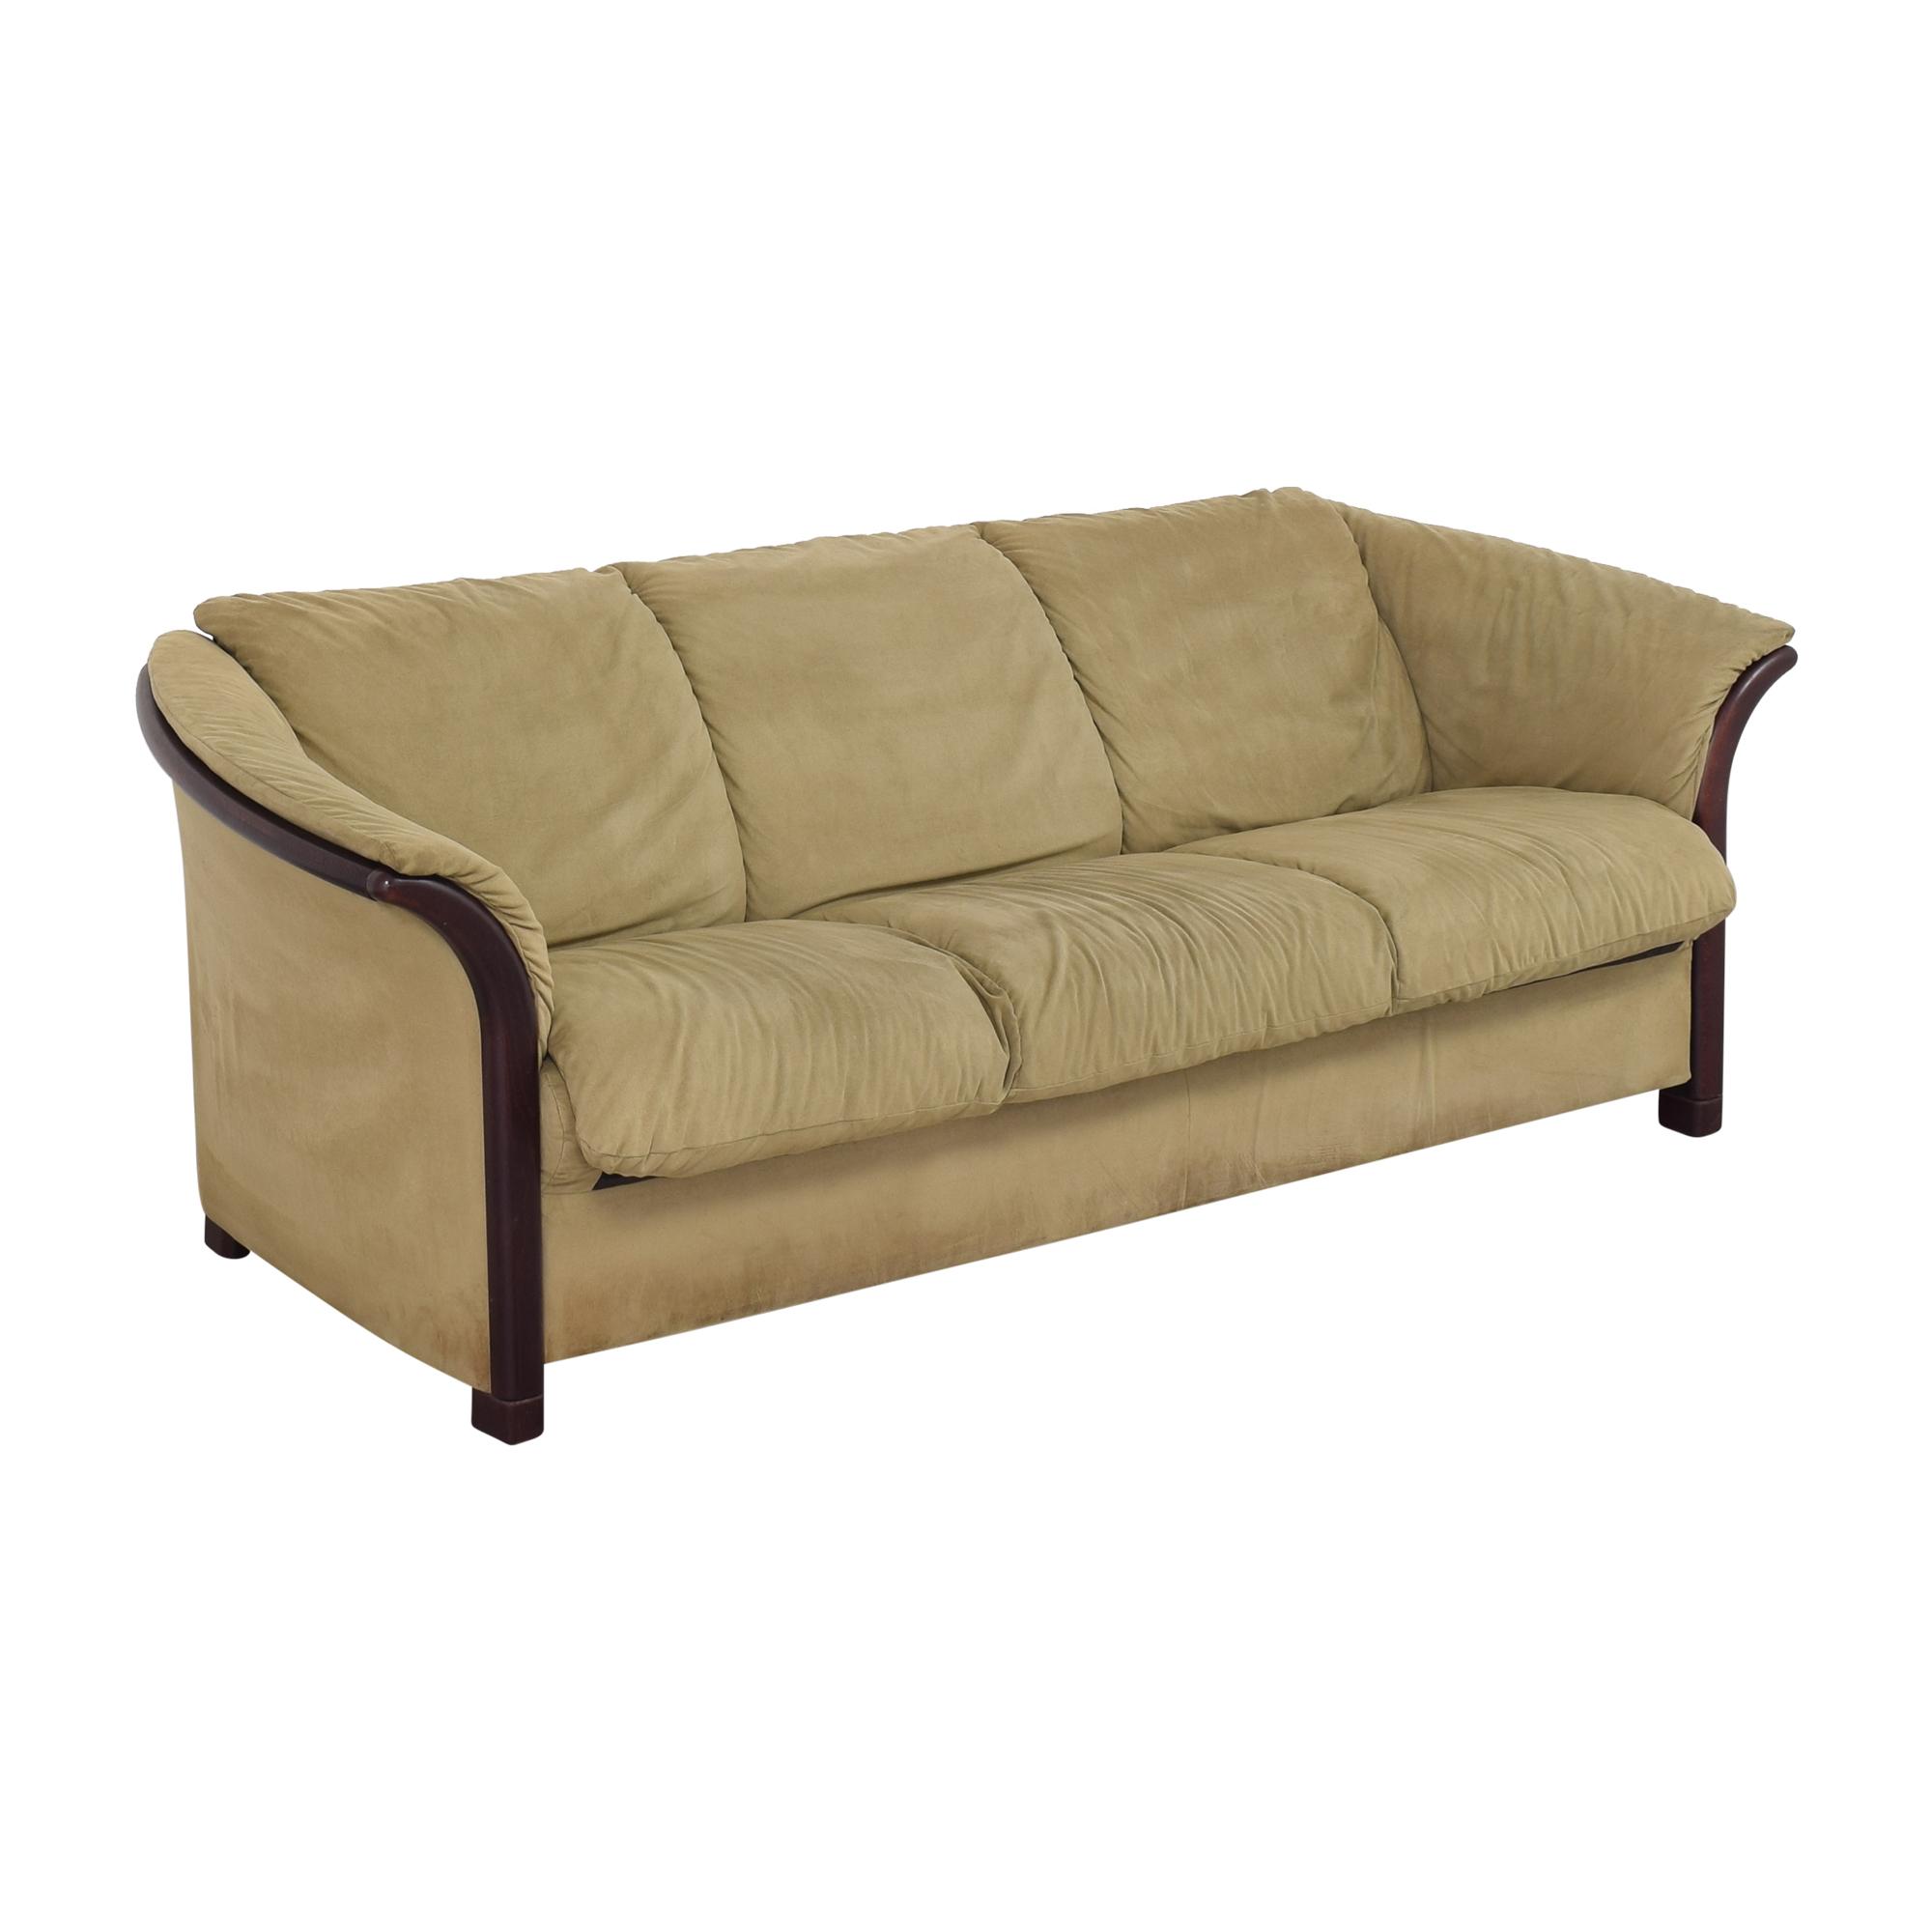 shop Ekornes Ekornes Manhattan Three Seat Sofa online